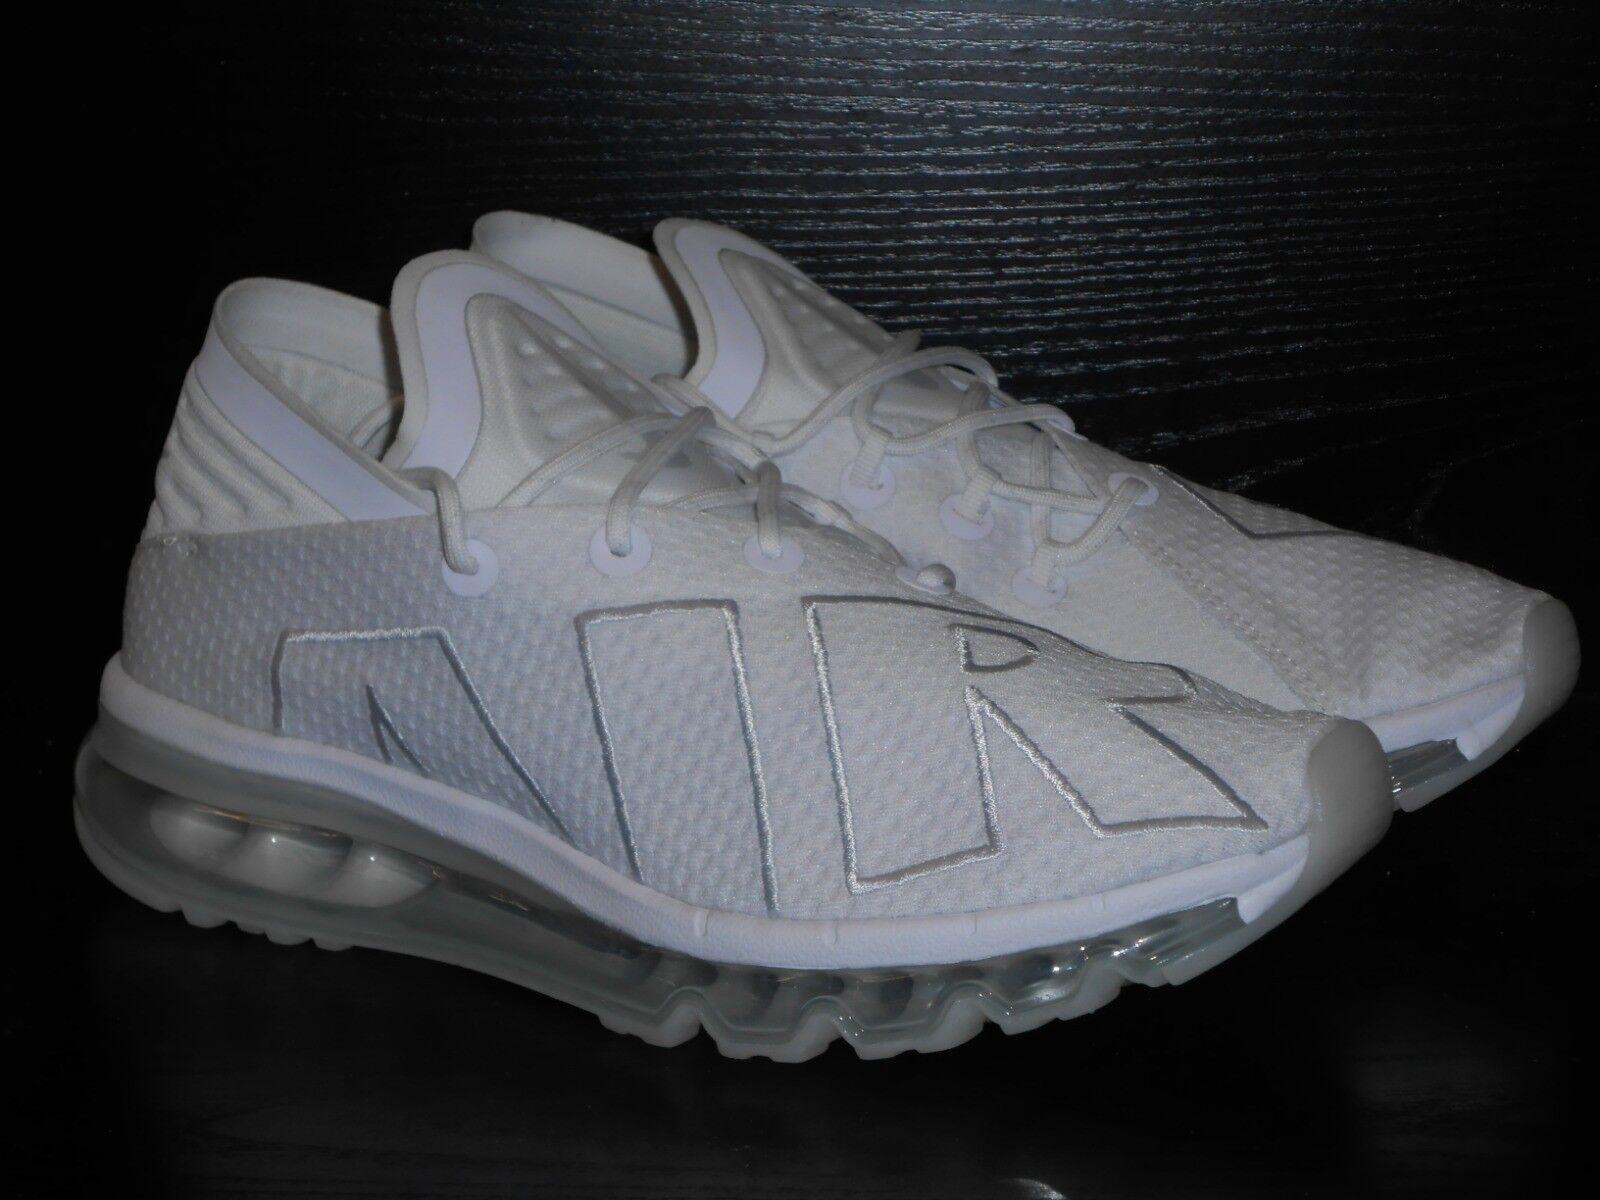 Nike Air Max Max Max Flair   Herren Running Trainer Schuhe Größe 6 Weiß  /- Run 29c9ab